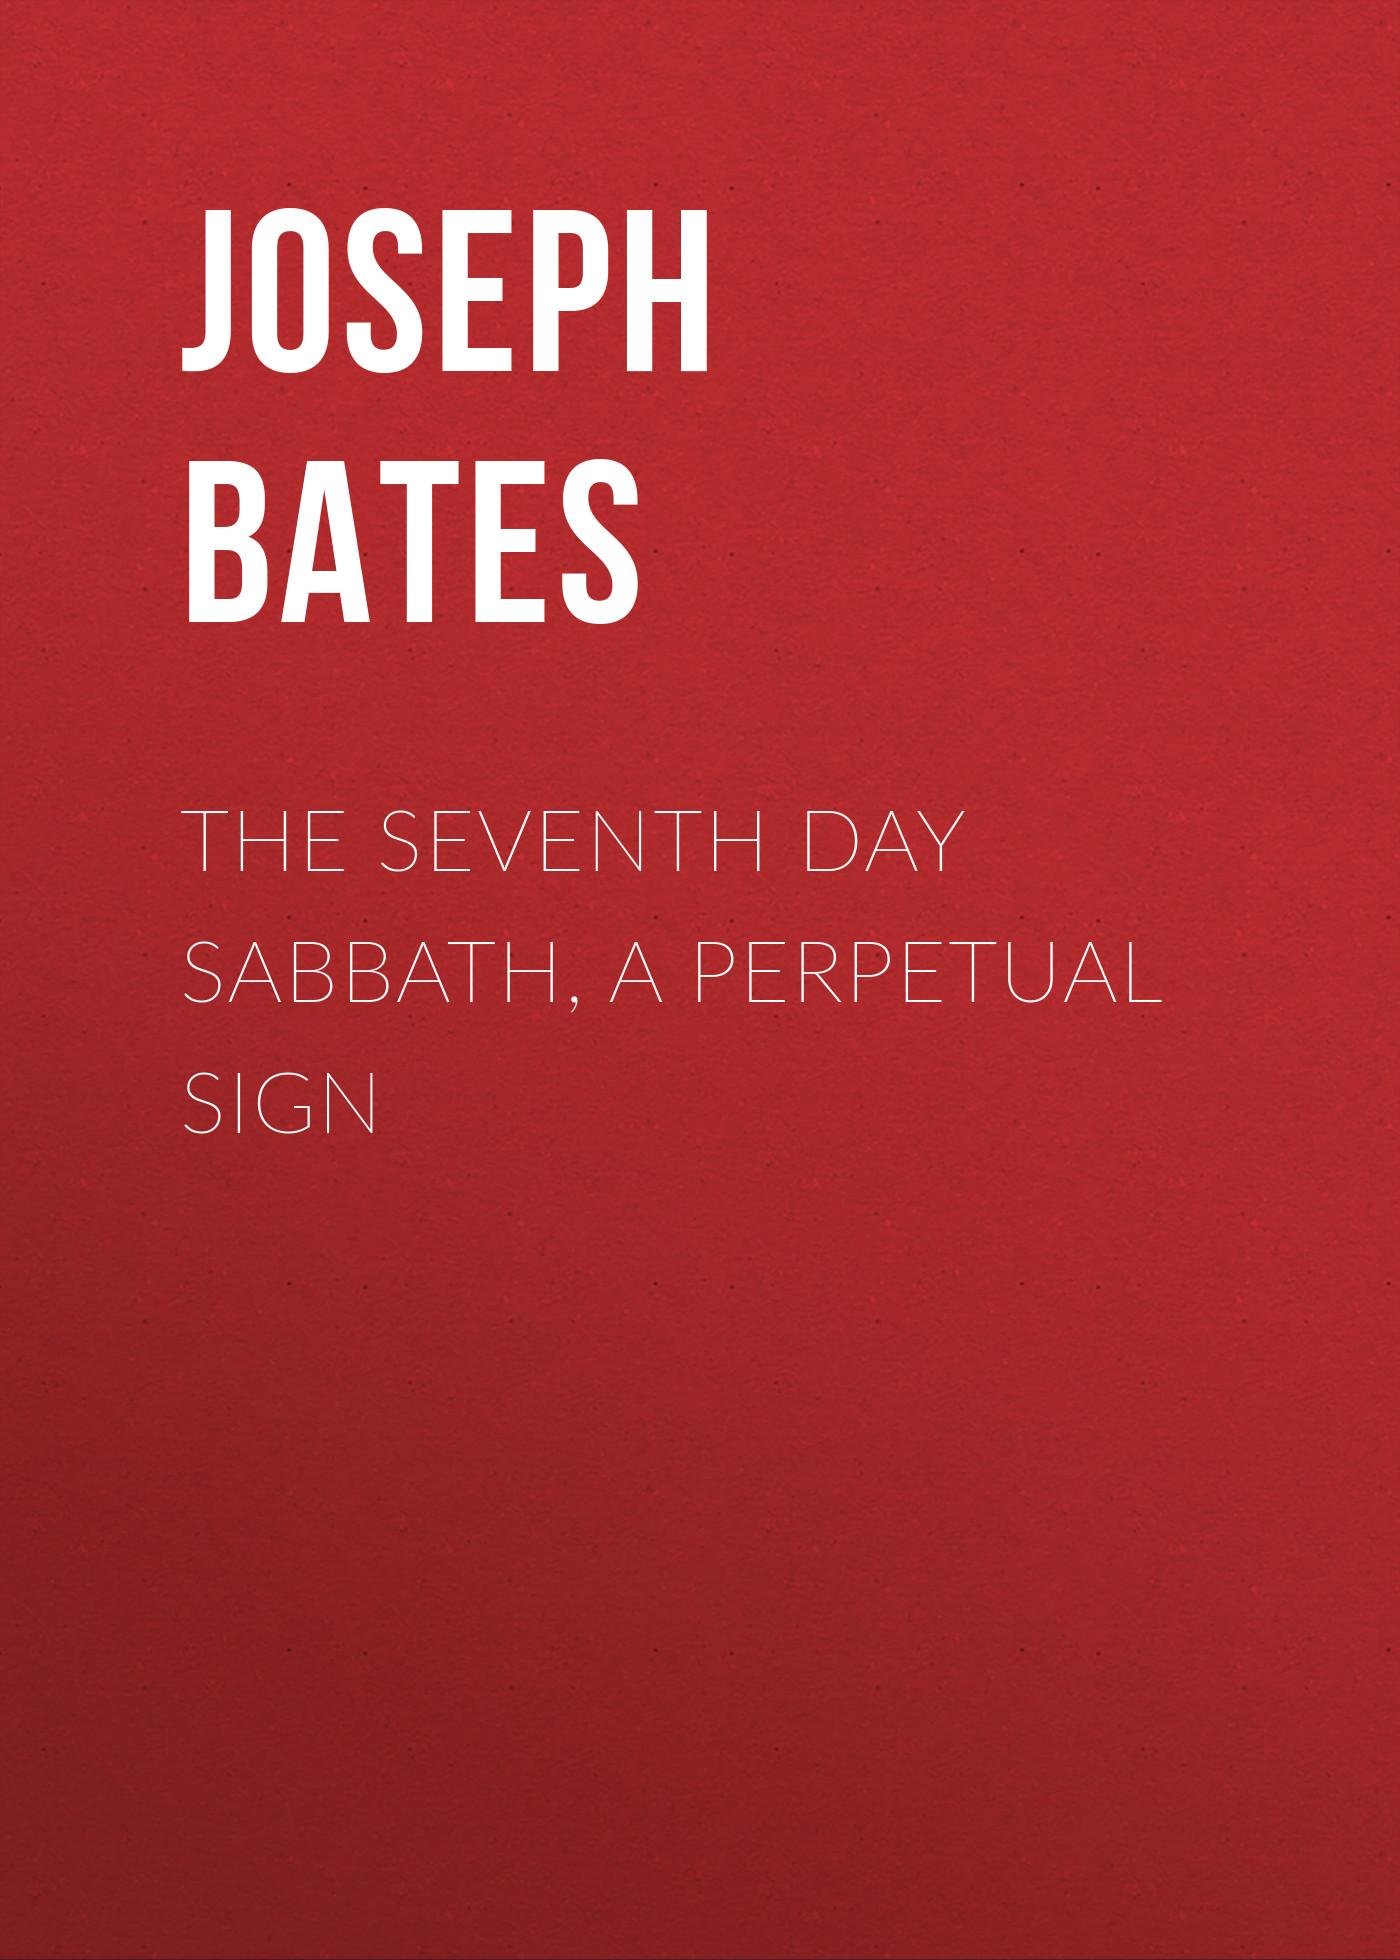 Joseph Bates The Seventh Day Sabbath, a Perpetual Sign joseph bates a vindication of the seventh day sabbath and the commandments of god